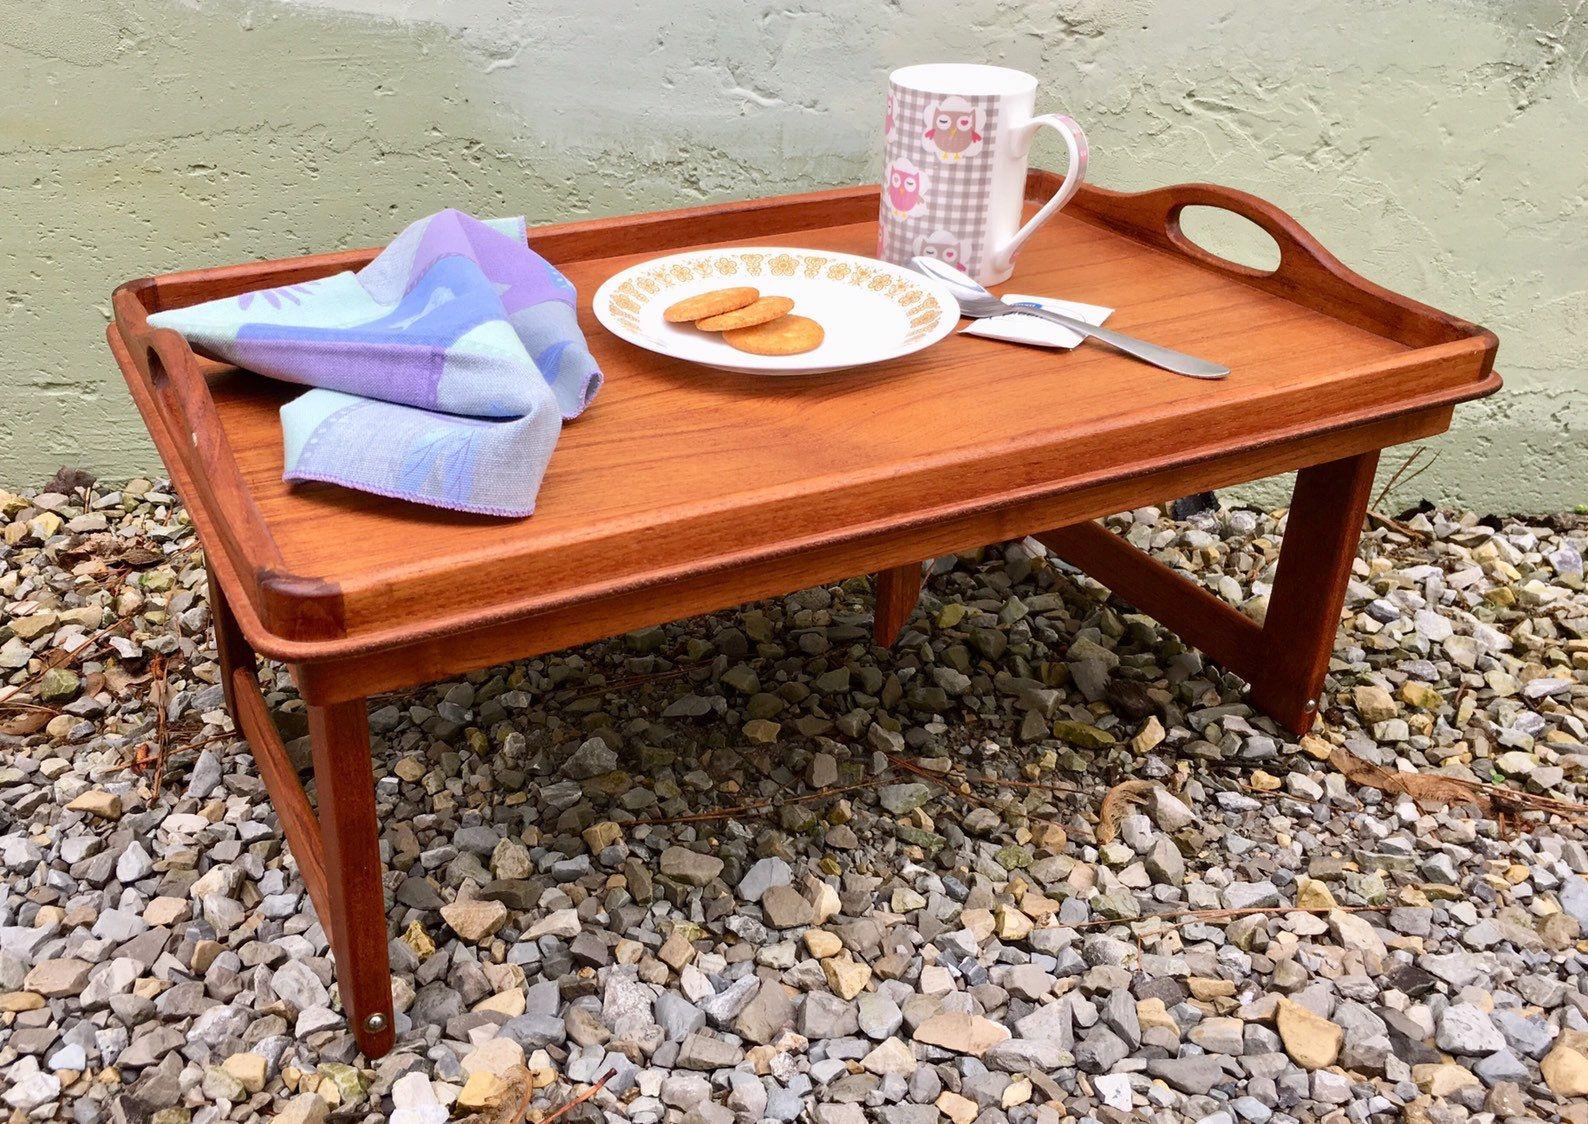 Antique 1970s Solid Teak Wooden Breakfast Tray With Legs Danish Mid Century Modern Serving Tray Repurposed Modern Serving Trays Danish Mid Century Modern Teak